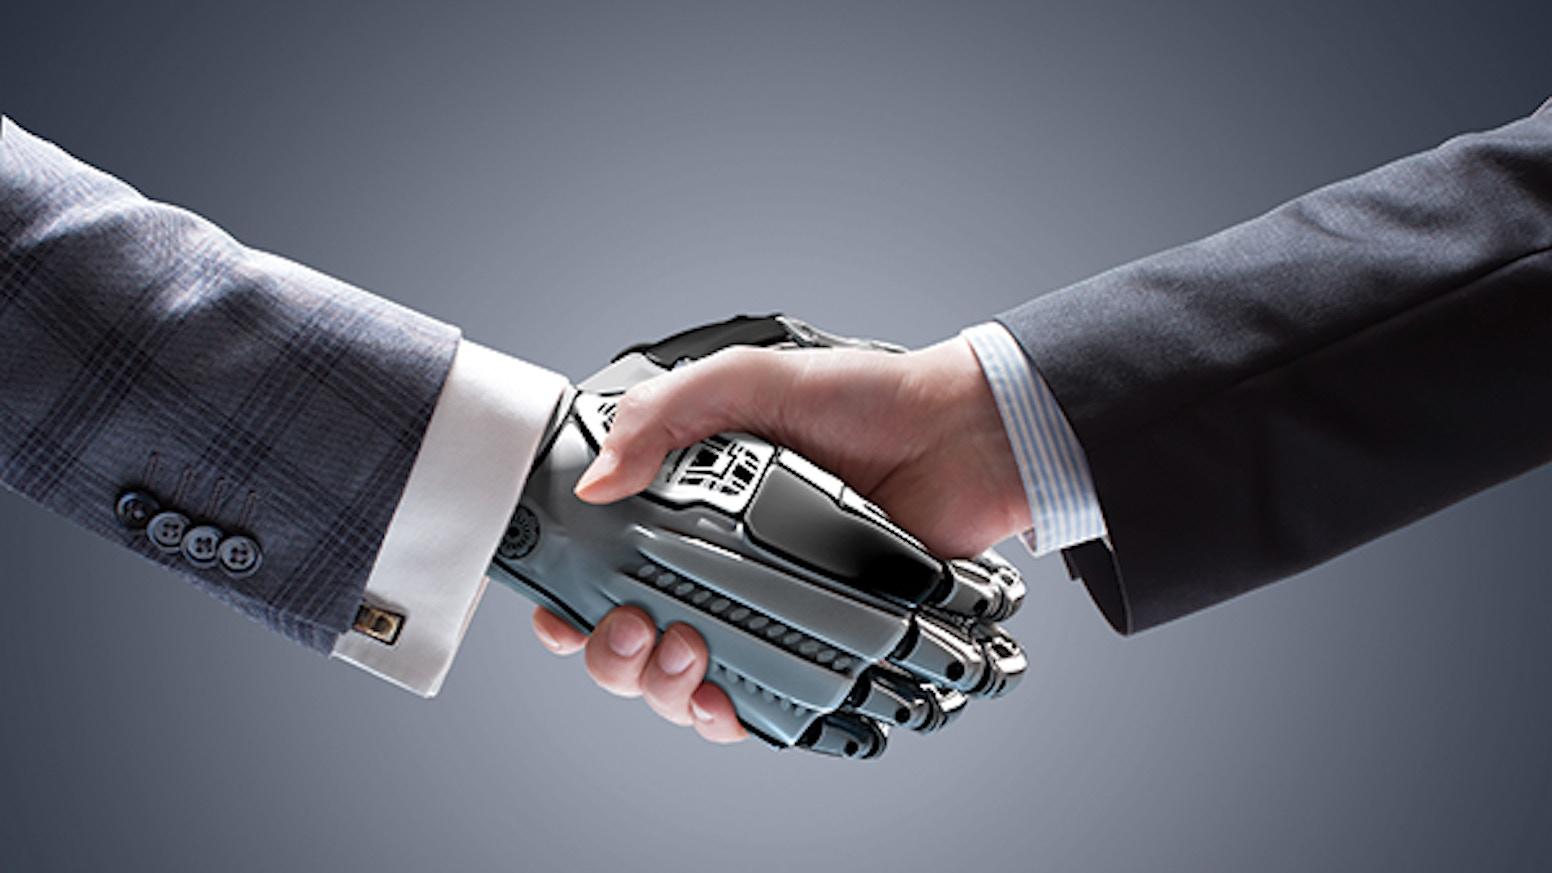 Soft, Pneumatically Powered Robotic Hand by Zack Kisner